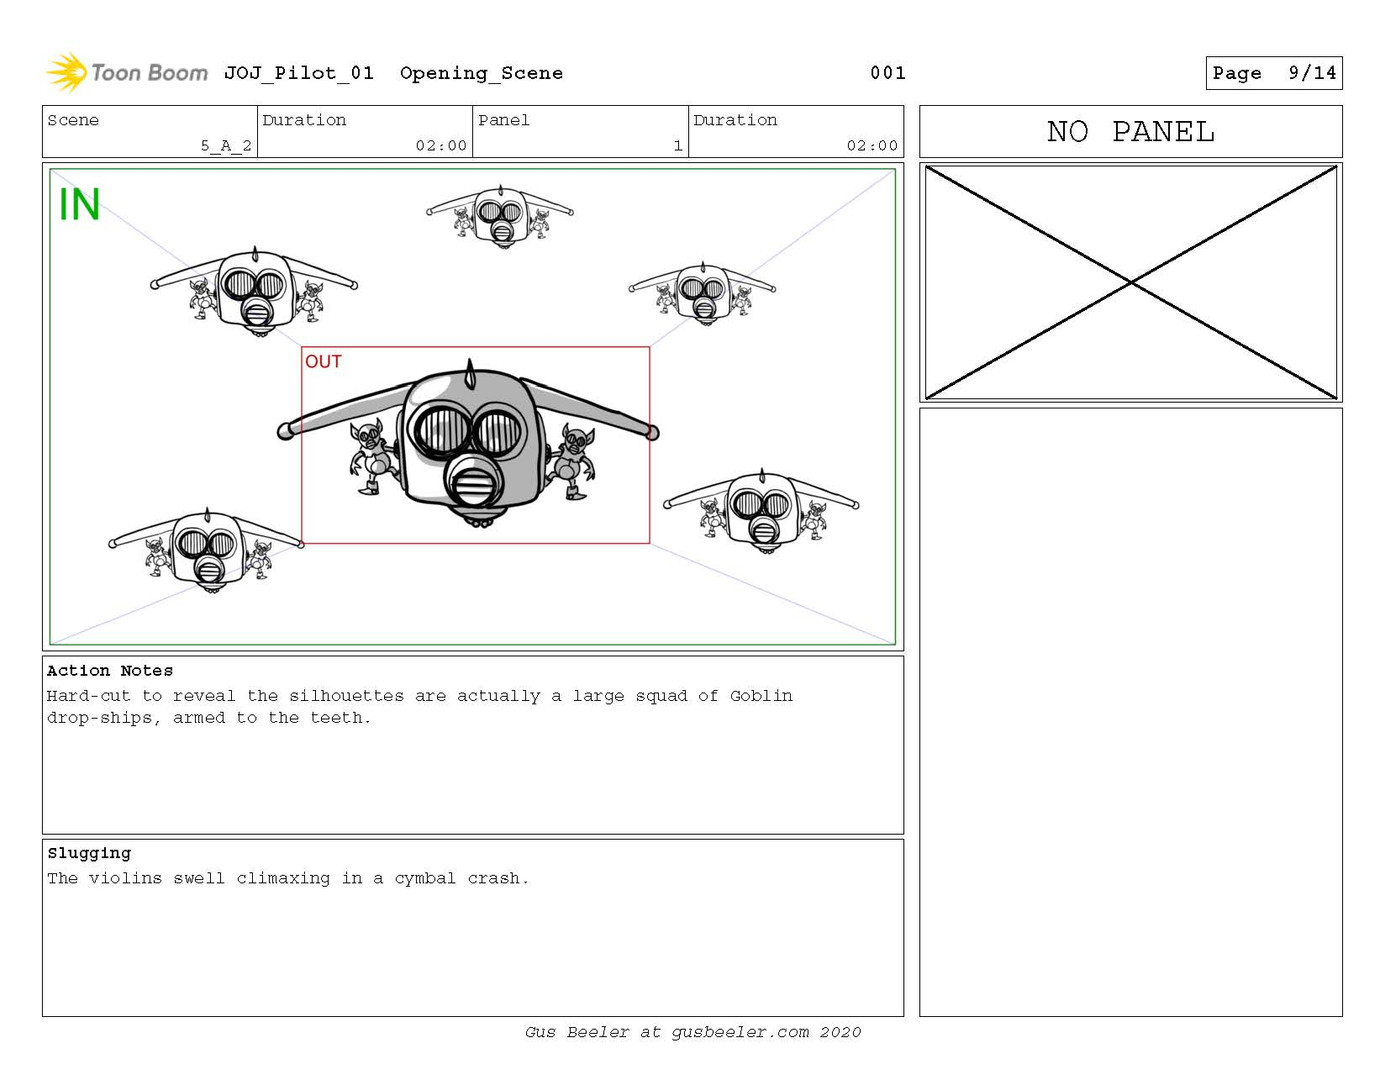 Abeeler_JOJ_Pilot_002_Page_10.jpg